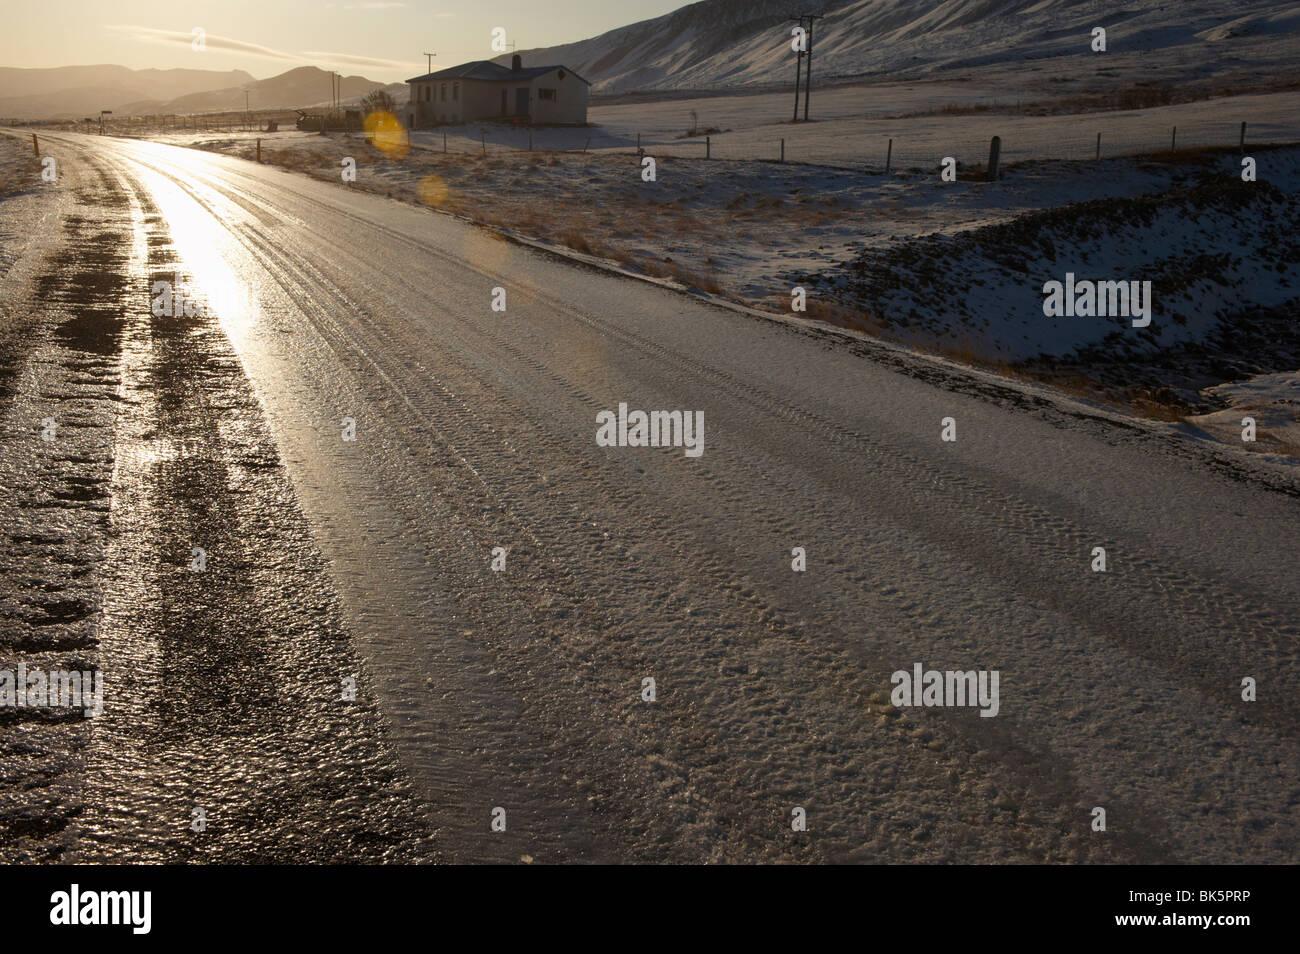 Road in Borgarfjordur Eystri fjord, East Fjords, Iceland, Polar Regions - Stock Image